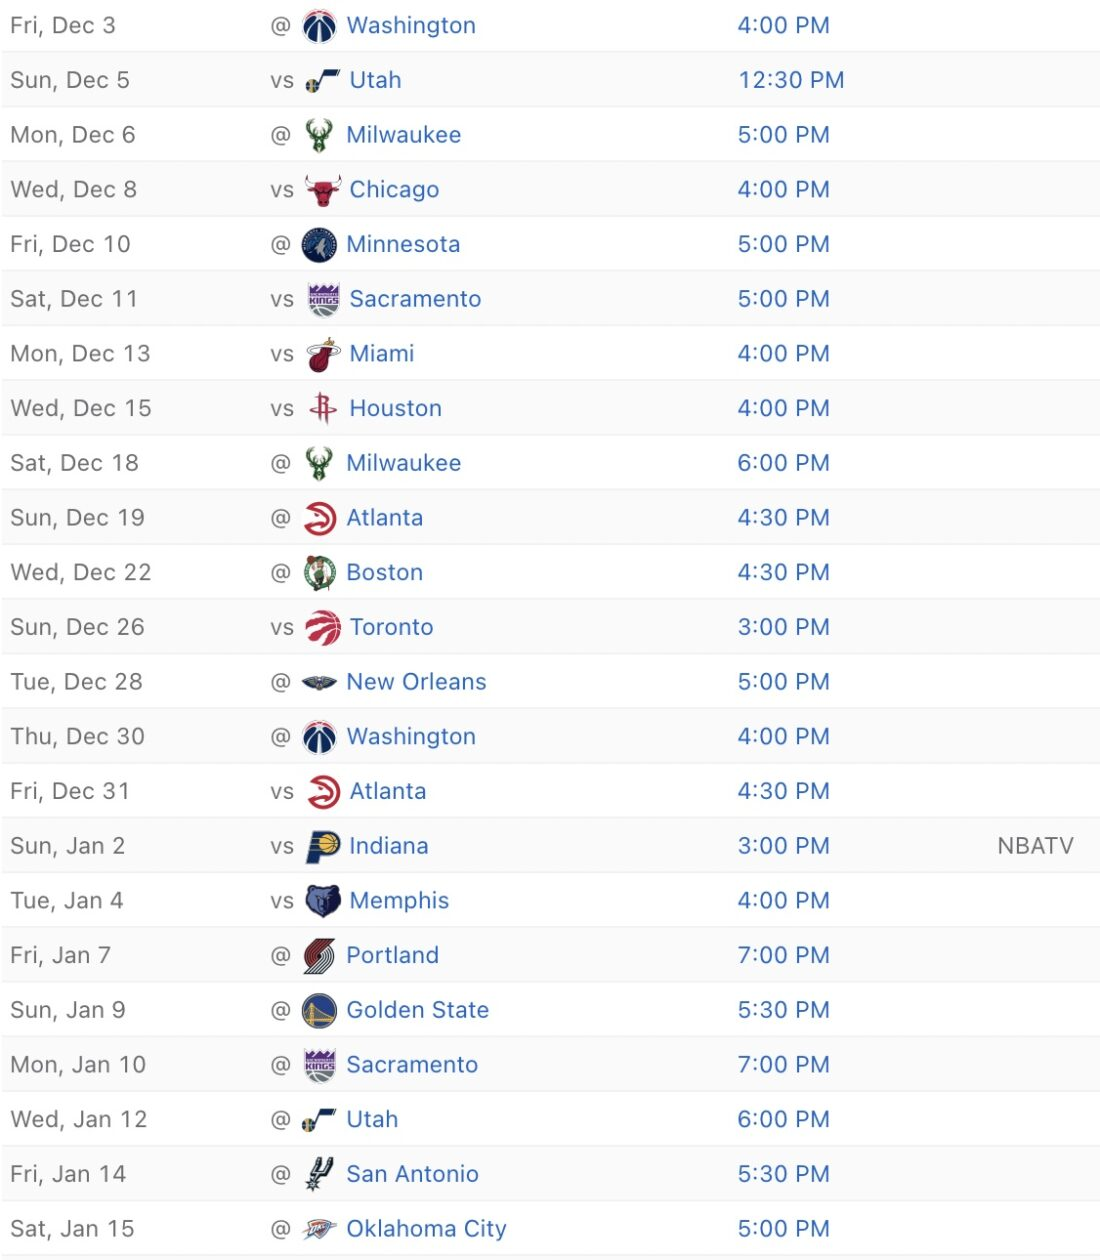 2021-22 Cavs schedule